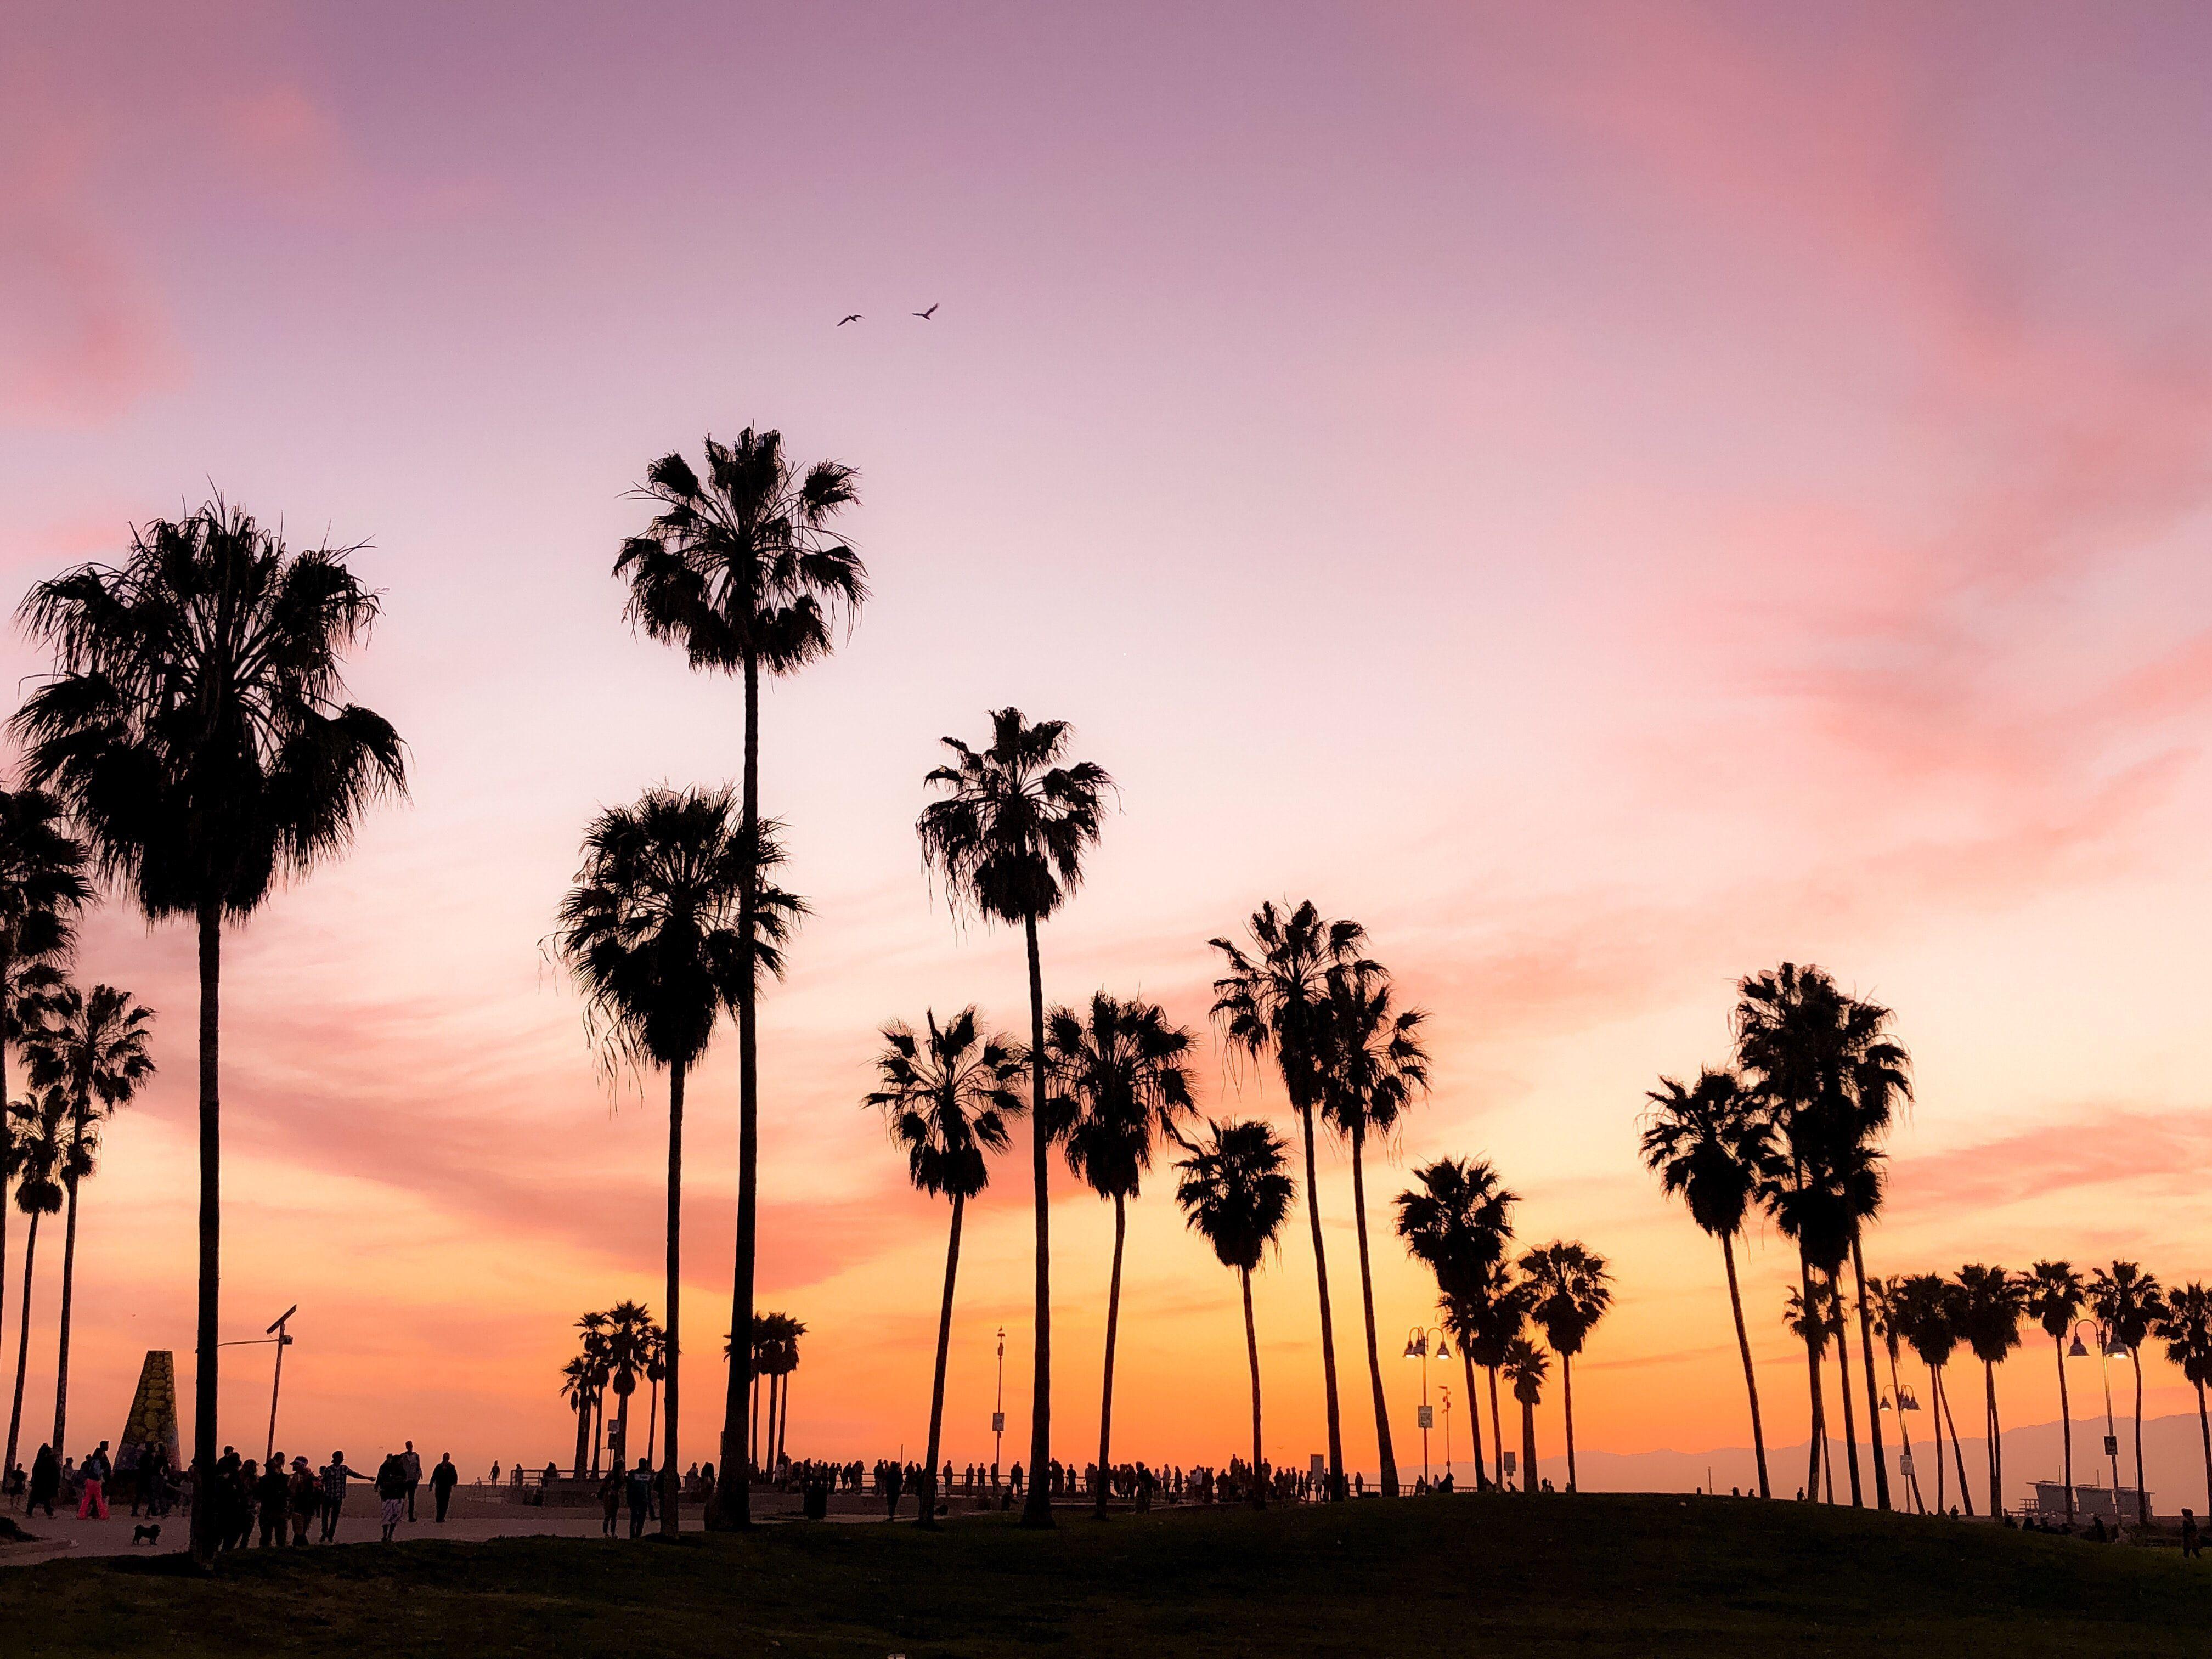 california sunset 4k Wallpapers - Top Free california ...